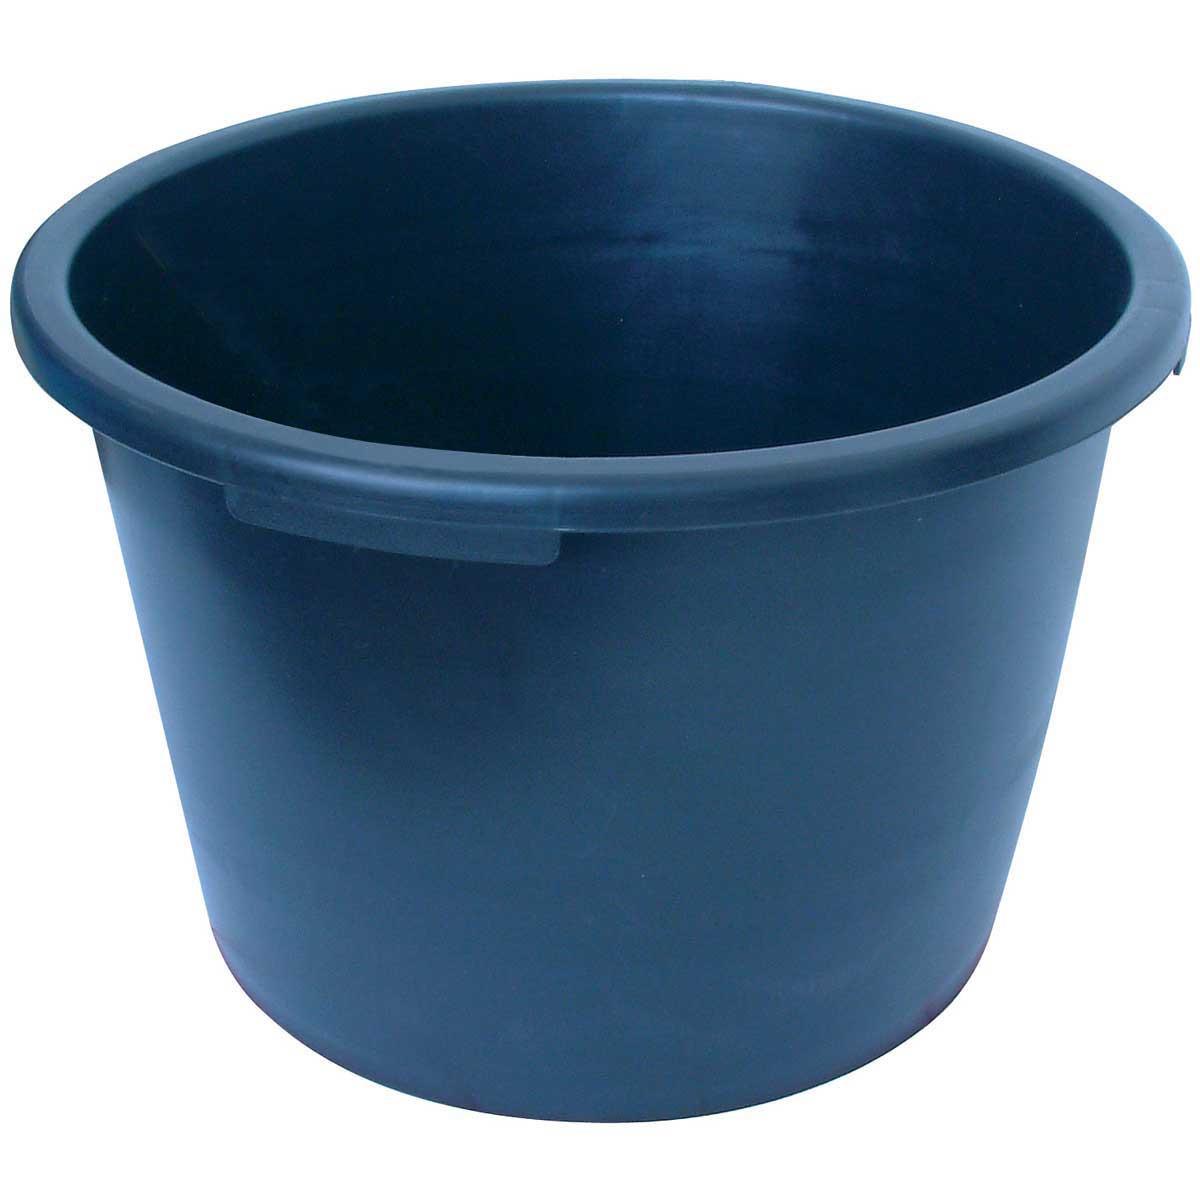 12 Gallon Bucket with Handle MXJPMB Raimondi